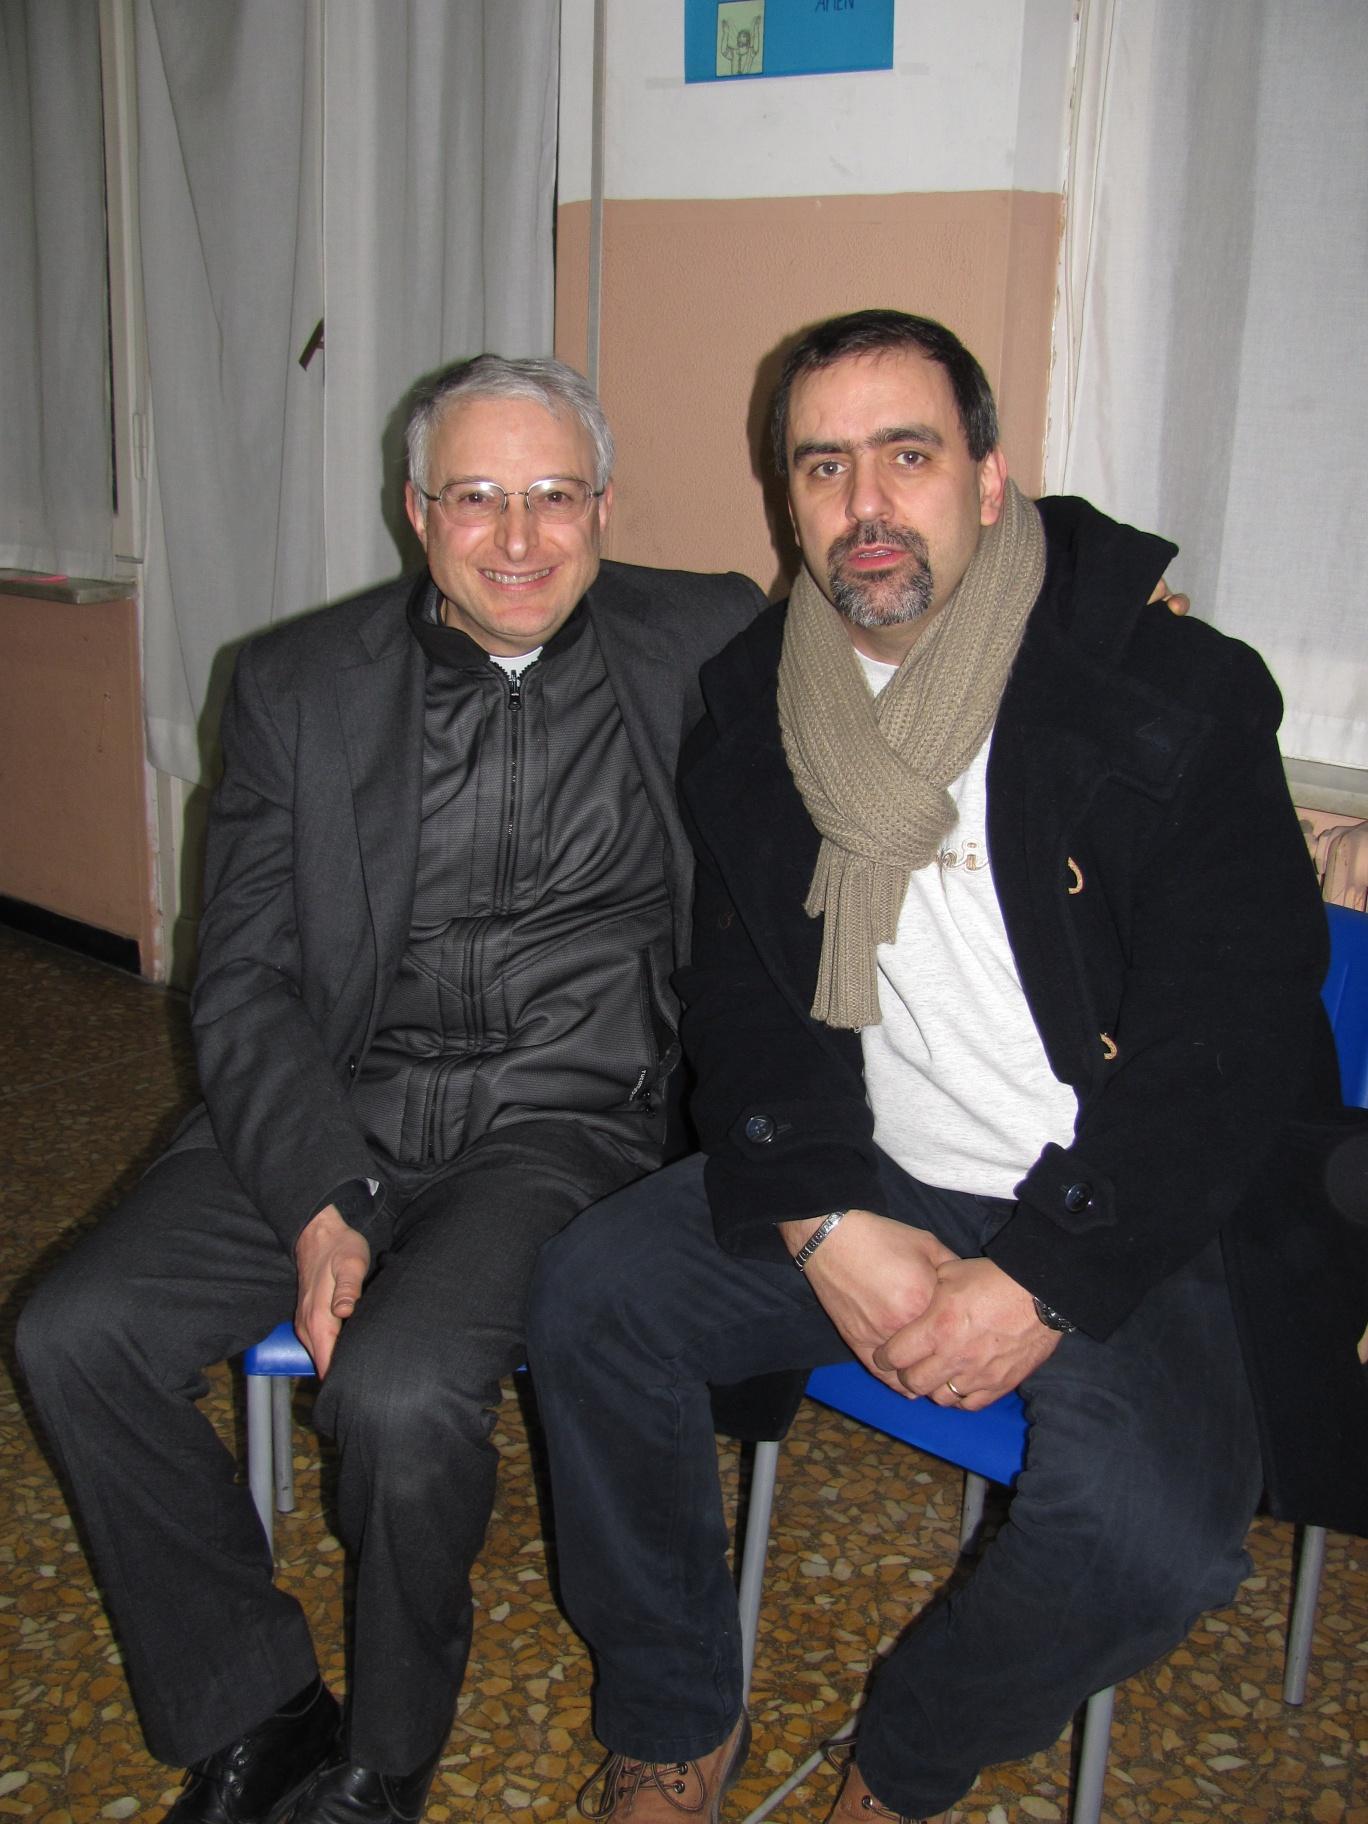 ricordo_battesimo_gesu_2011-01-23-18-05-38